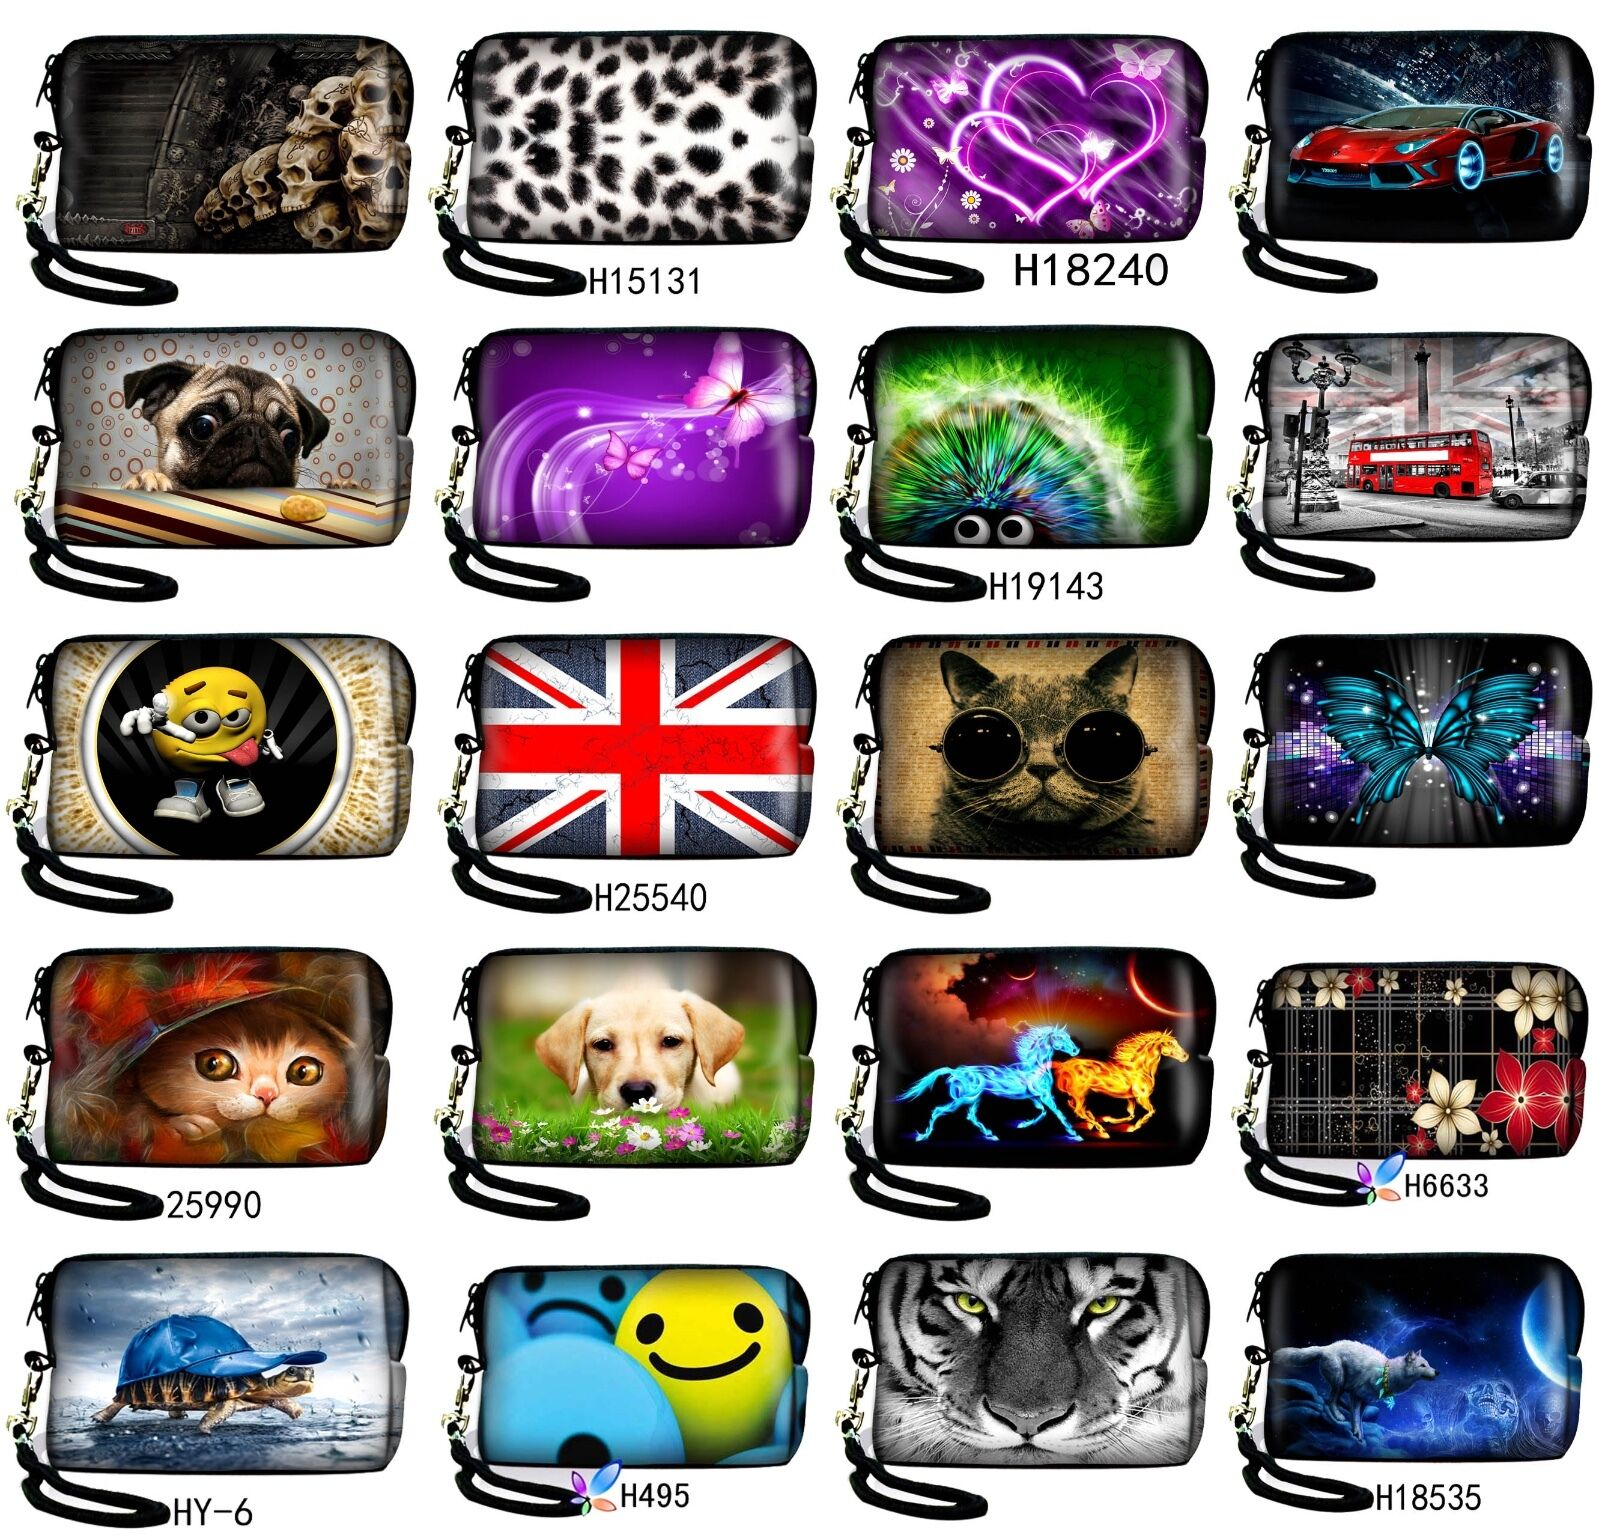 Neoprene Soft Compact Camera Case Pouch Holder Bag For Panasonic LUMIX DMC